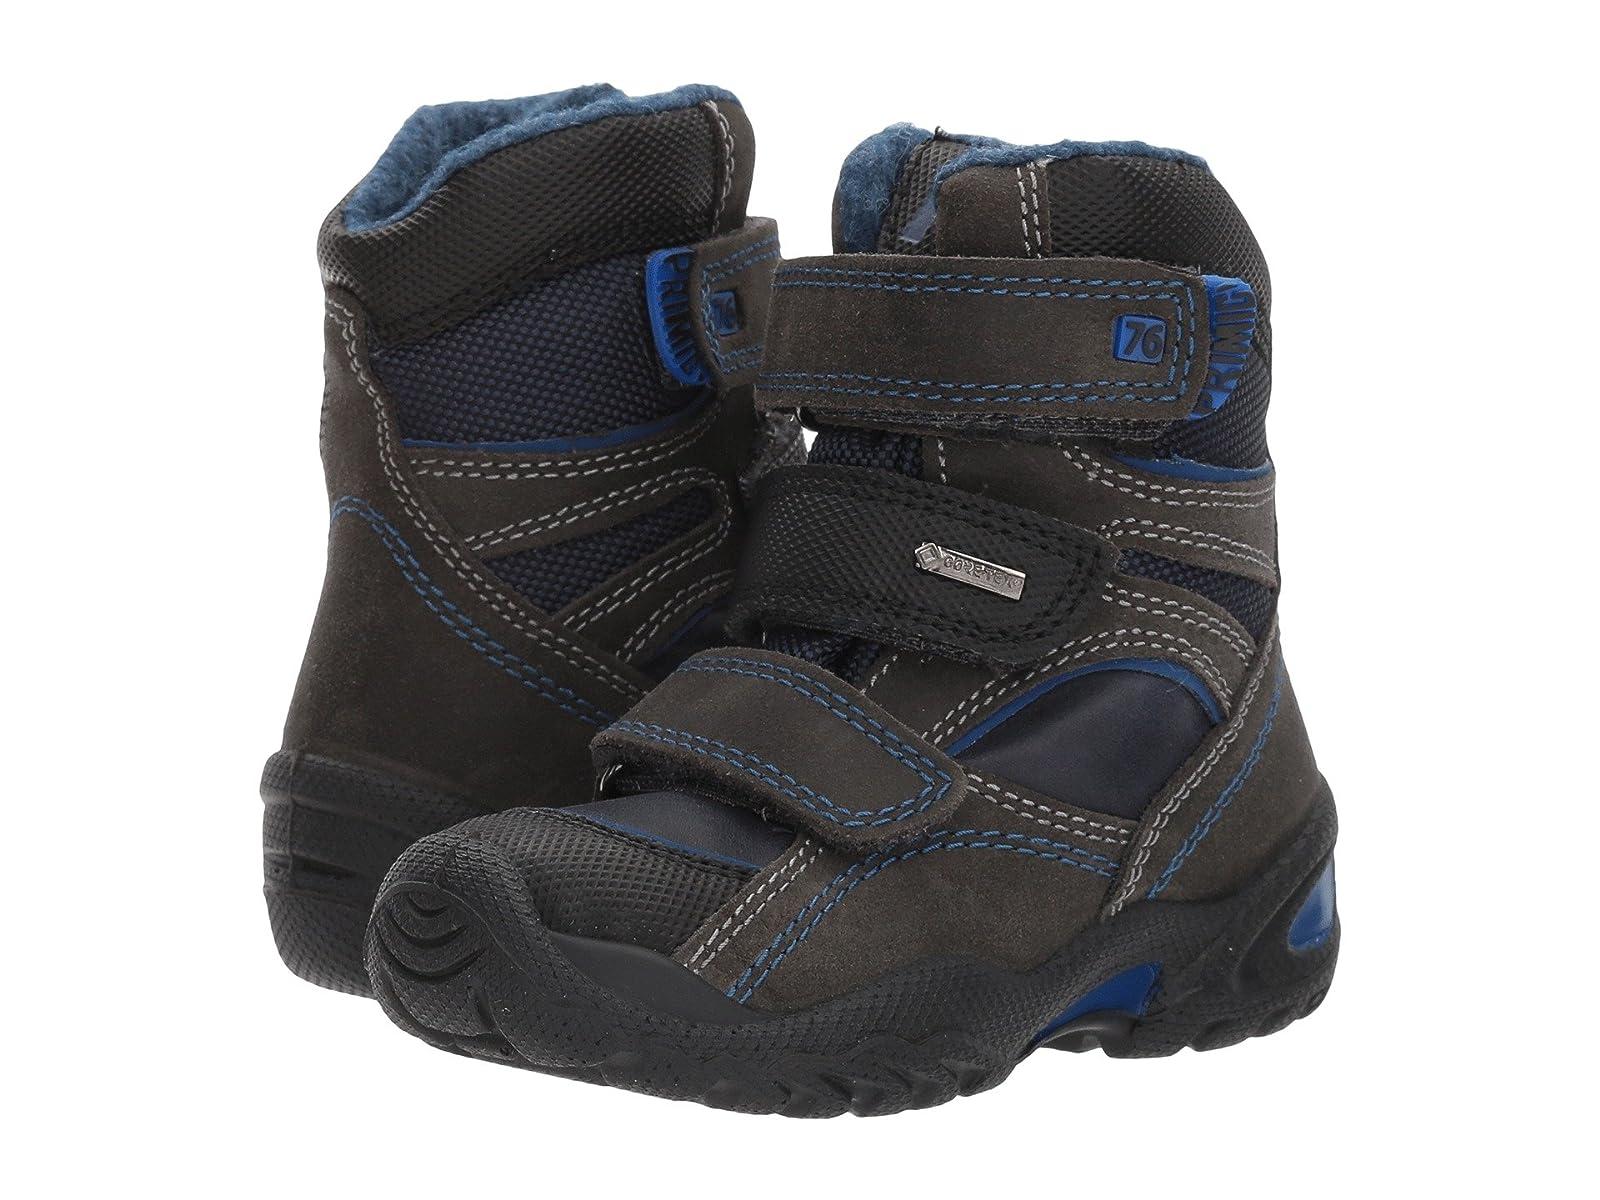 Primigi Kids PHAGT 8646 (Toddler/Little Kid)Cheap and distinctive eye-catching shoes